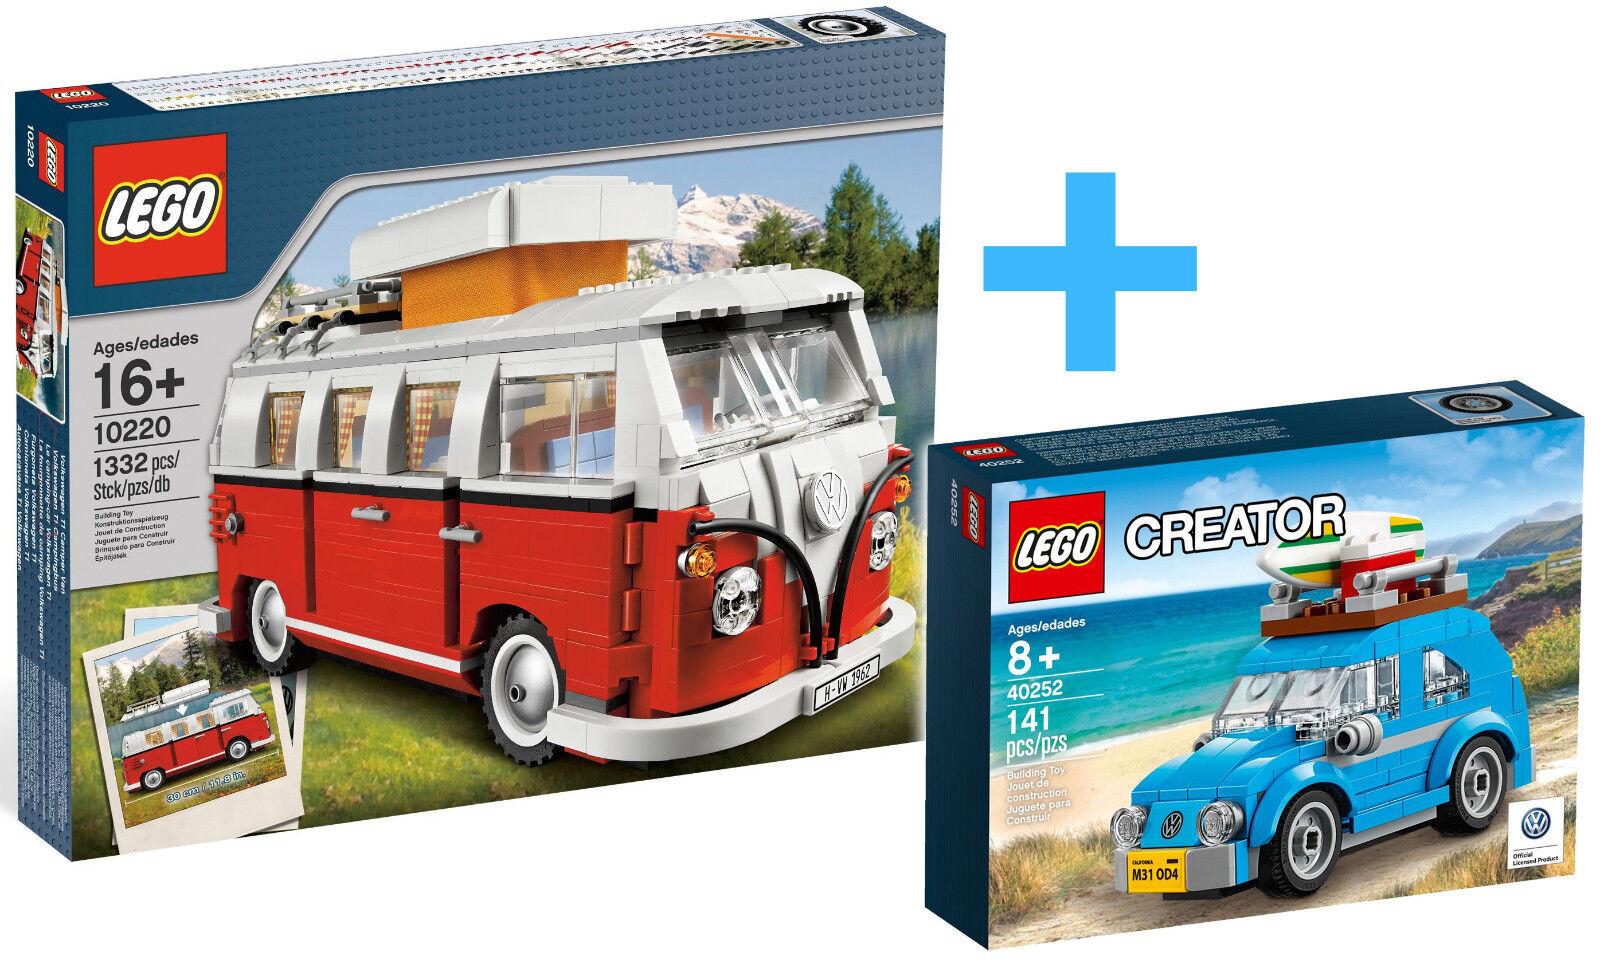 LEGO creator EXPERT 10220 Volkswagen  T1 Camper Van + 40252 Mini Beetle NEUFnouveau  le magasin